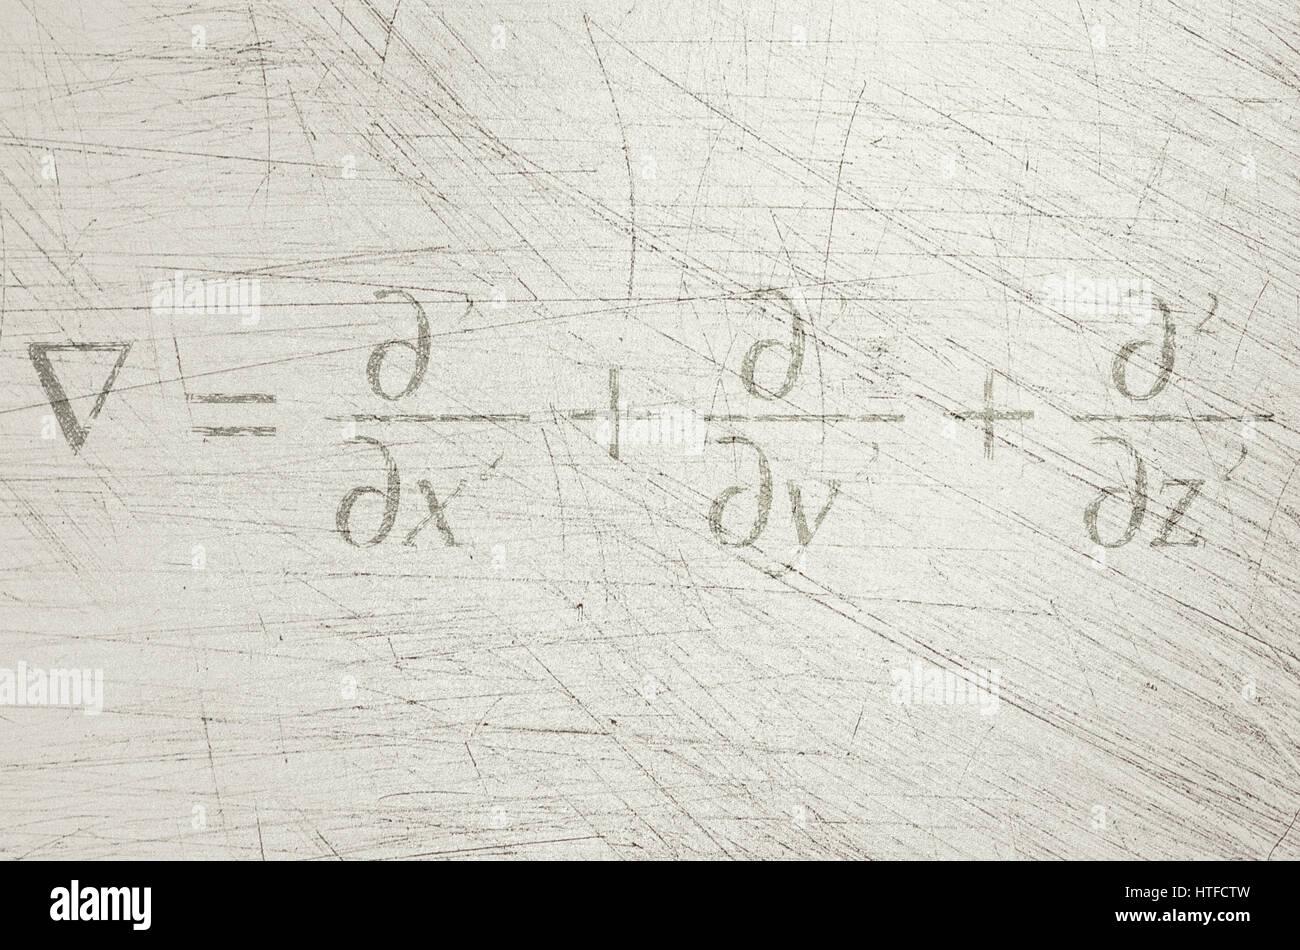 Math Symbols Stock Photos & Math Symbols Stock Images - Alamy